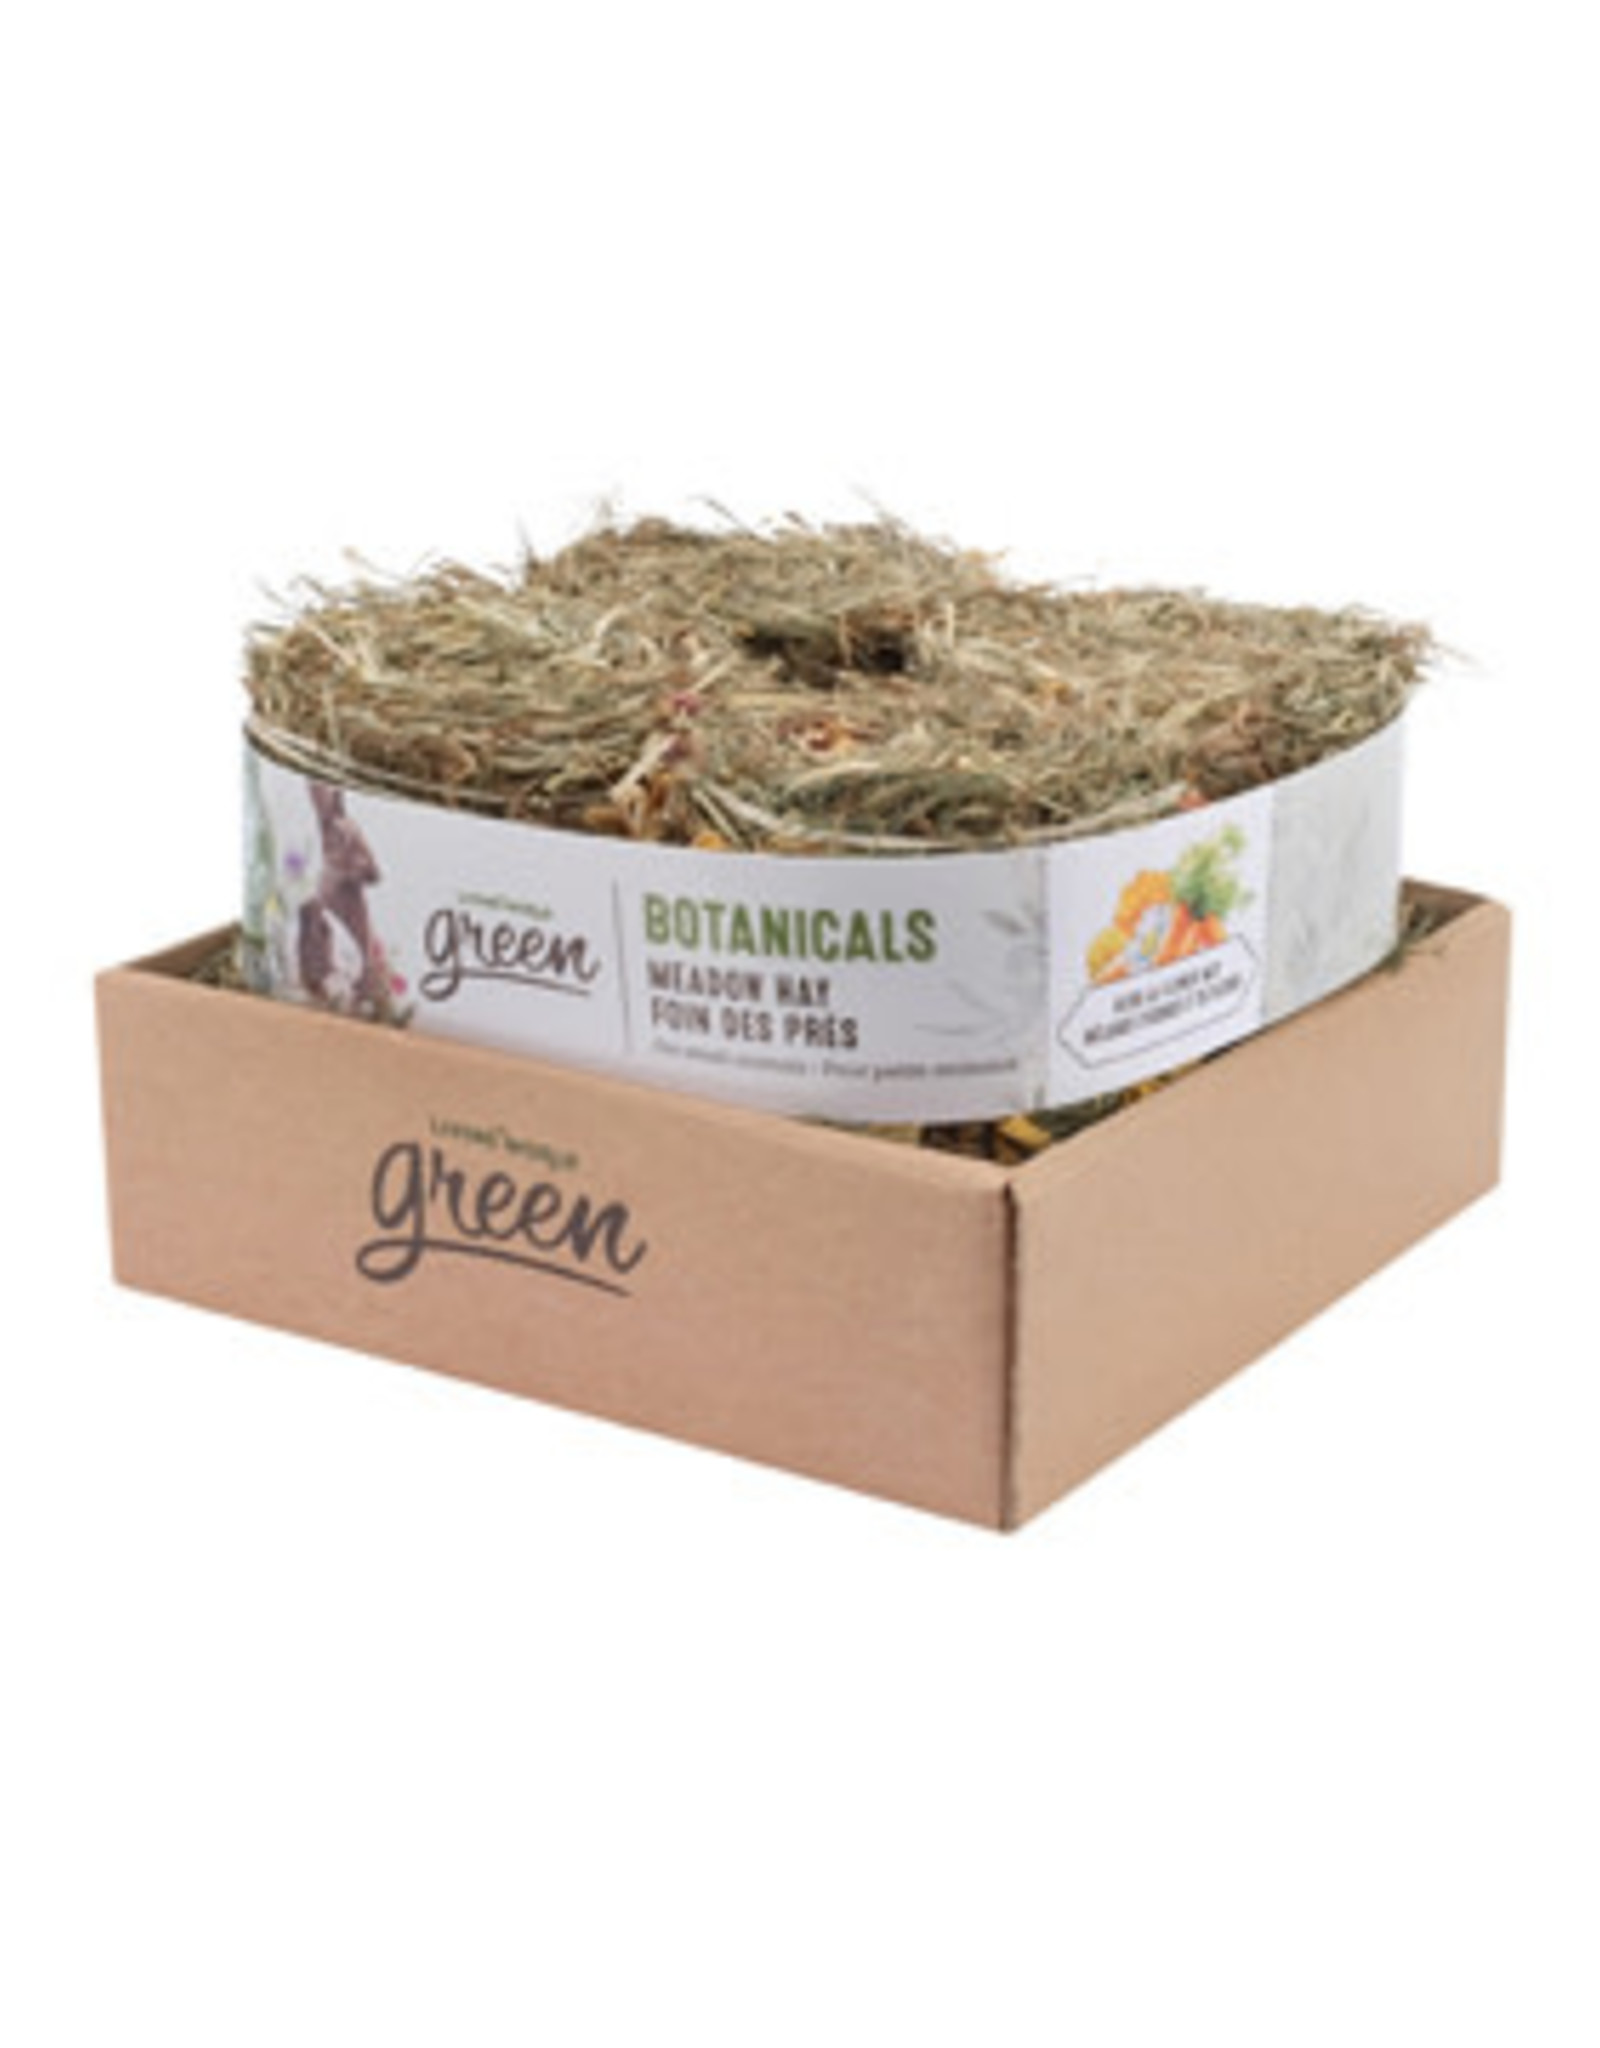 LIVING WORLD Living World Green Gourmet Toppers - Botanicals - 35 g (1.2 oz)